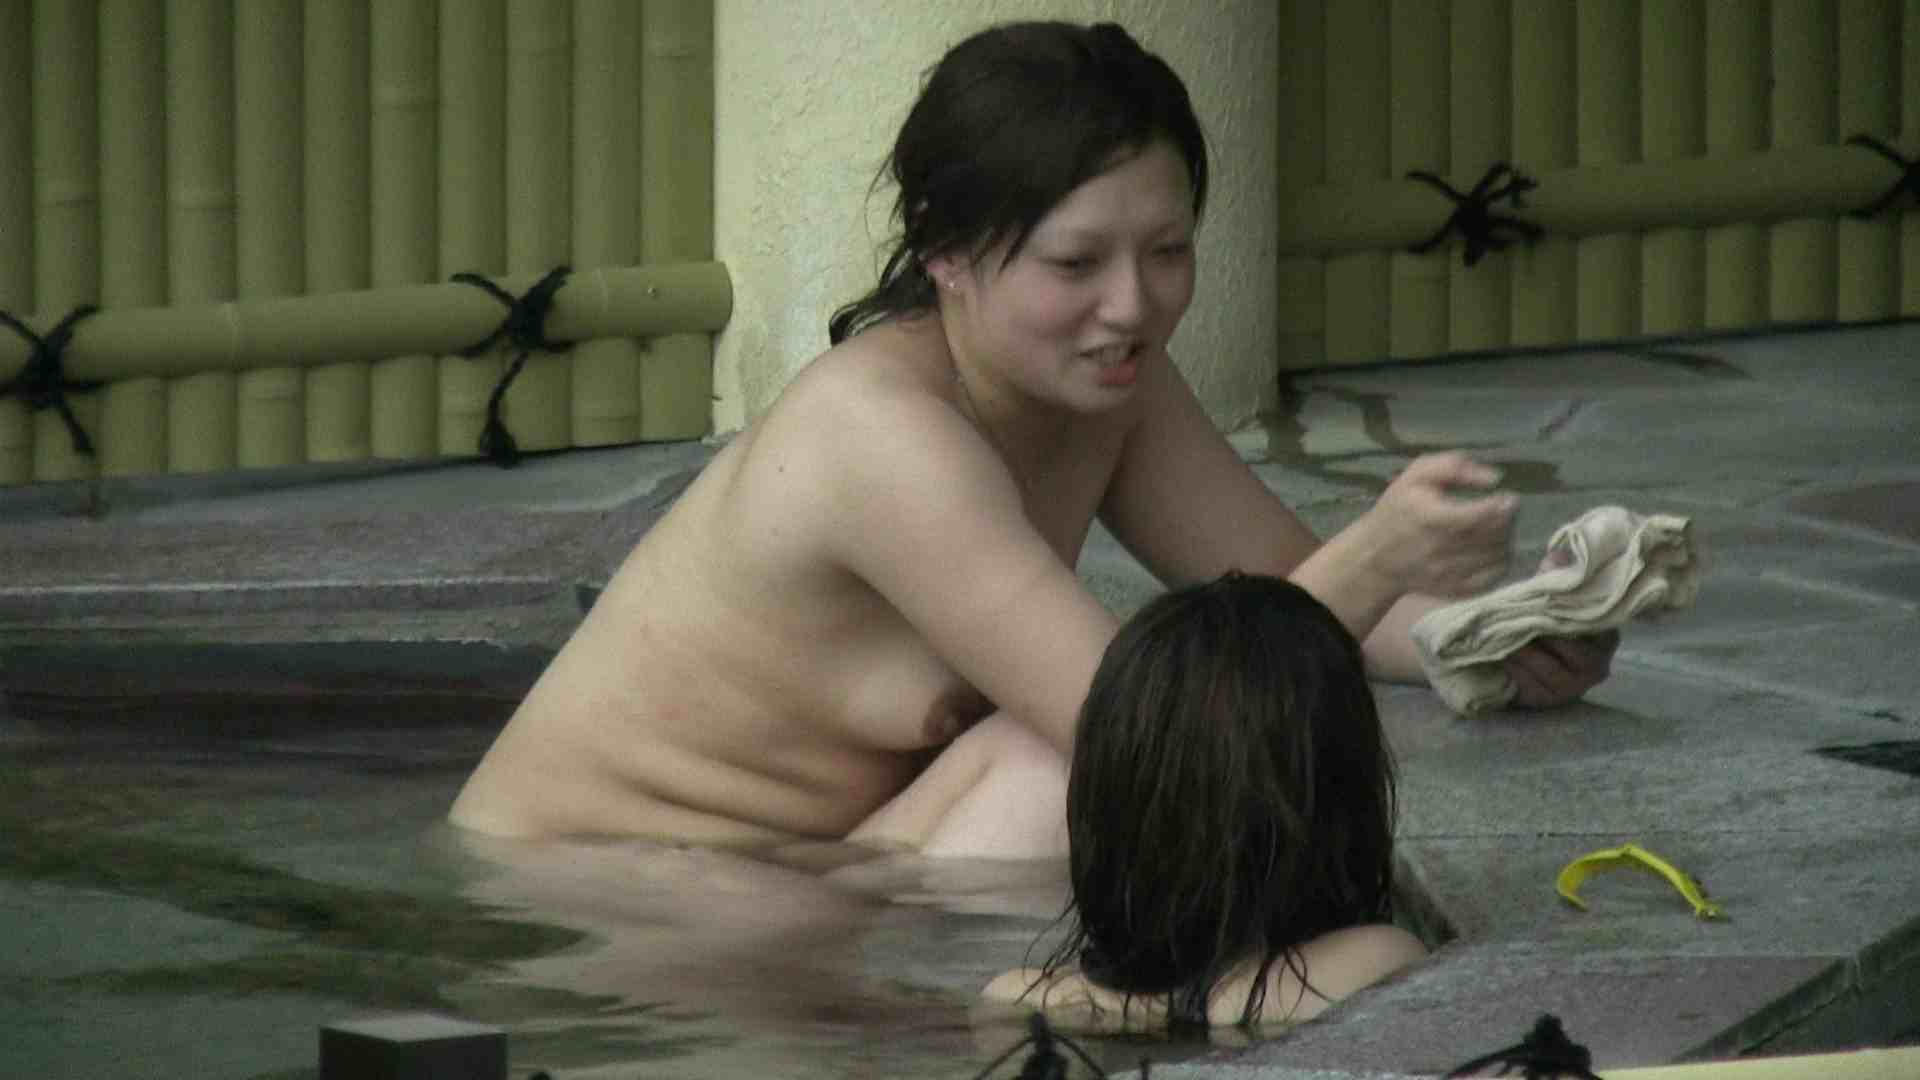 Aquaな露天風呂Vol.184 OLセックス | 盗撮  81画像 73